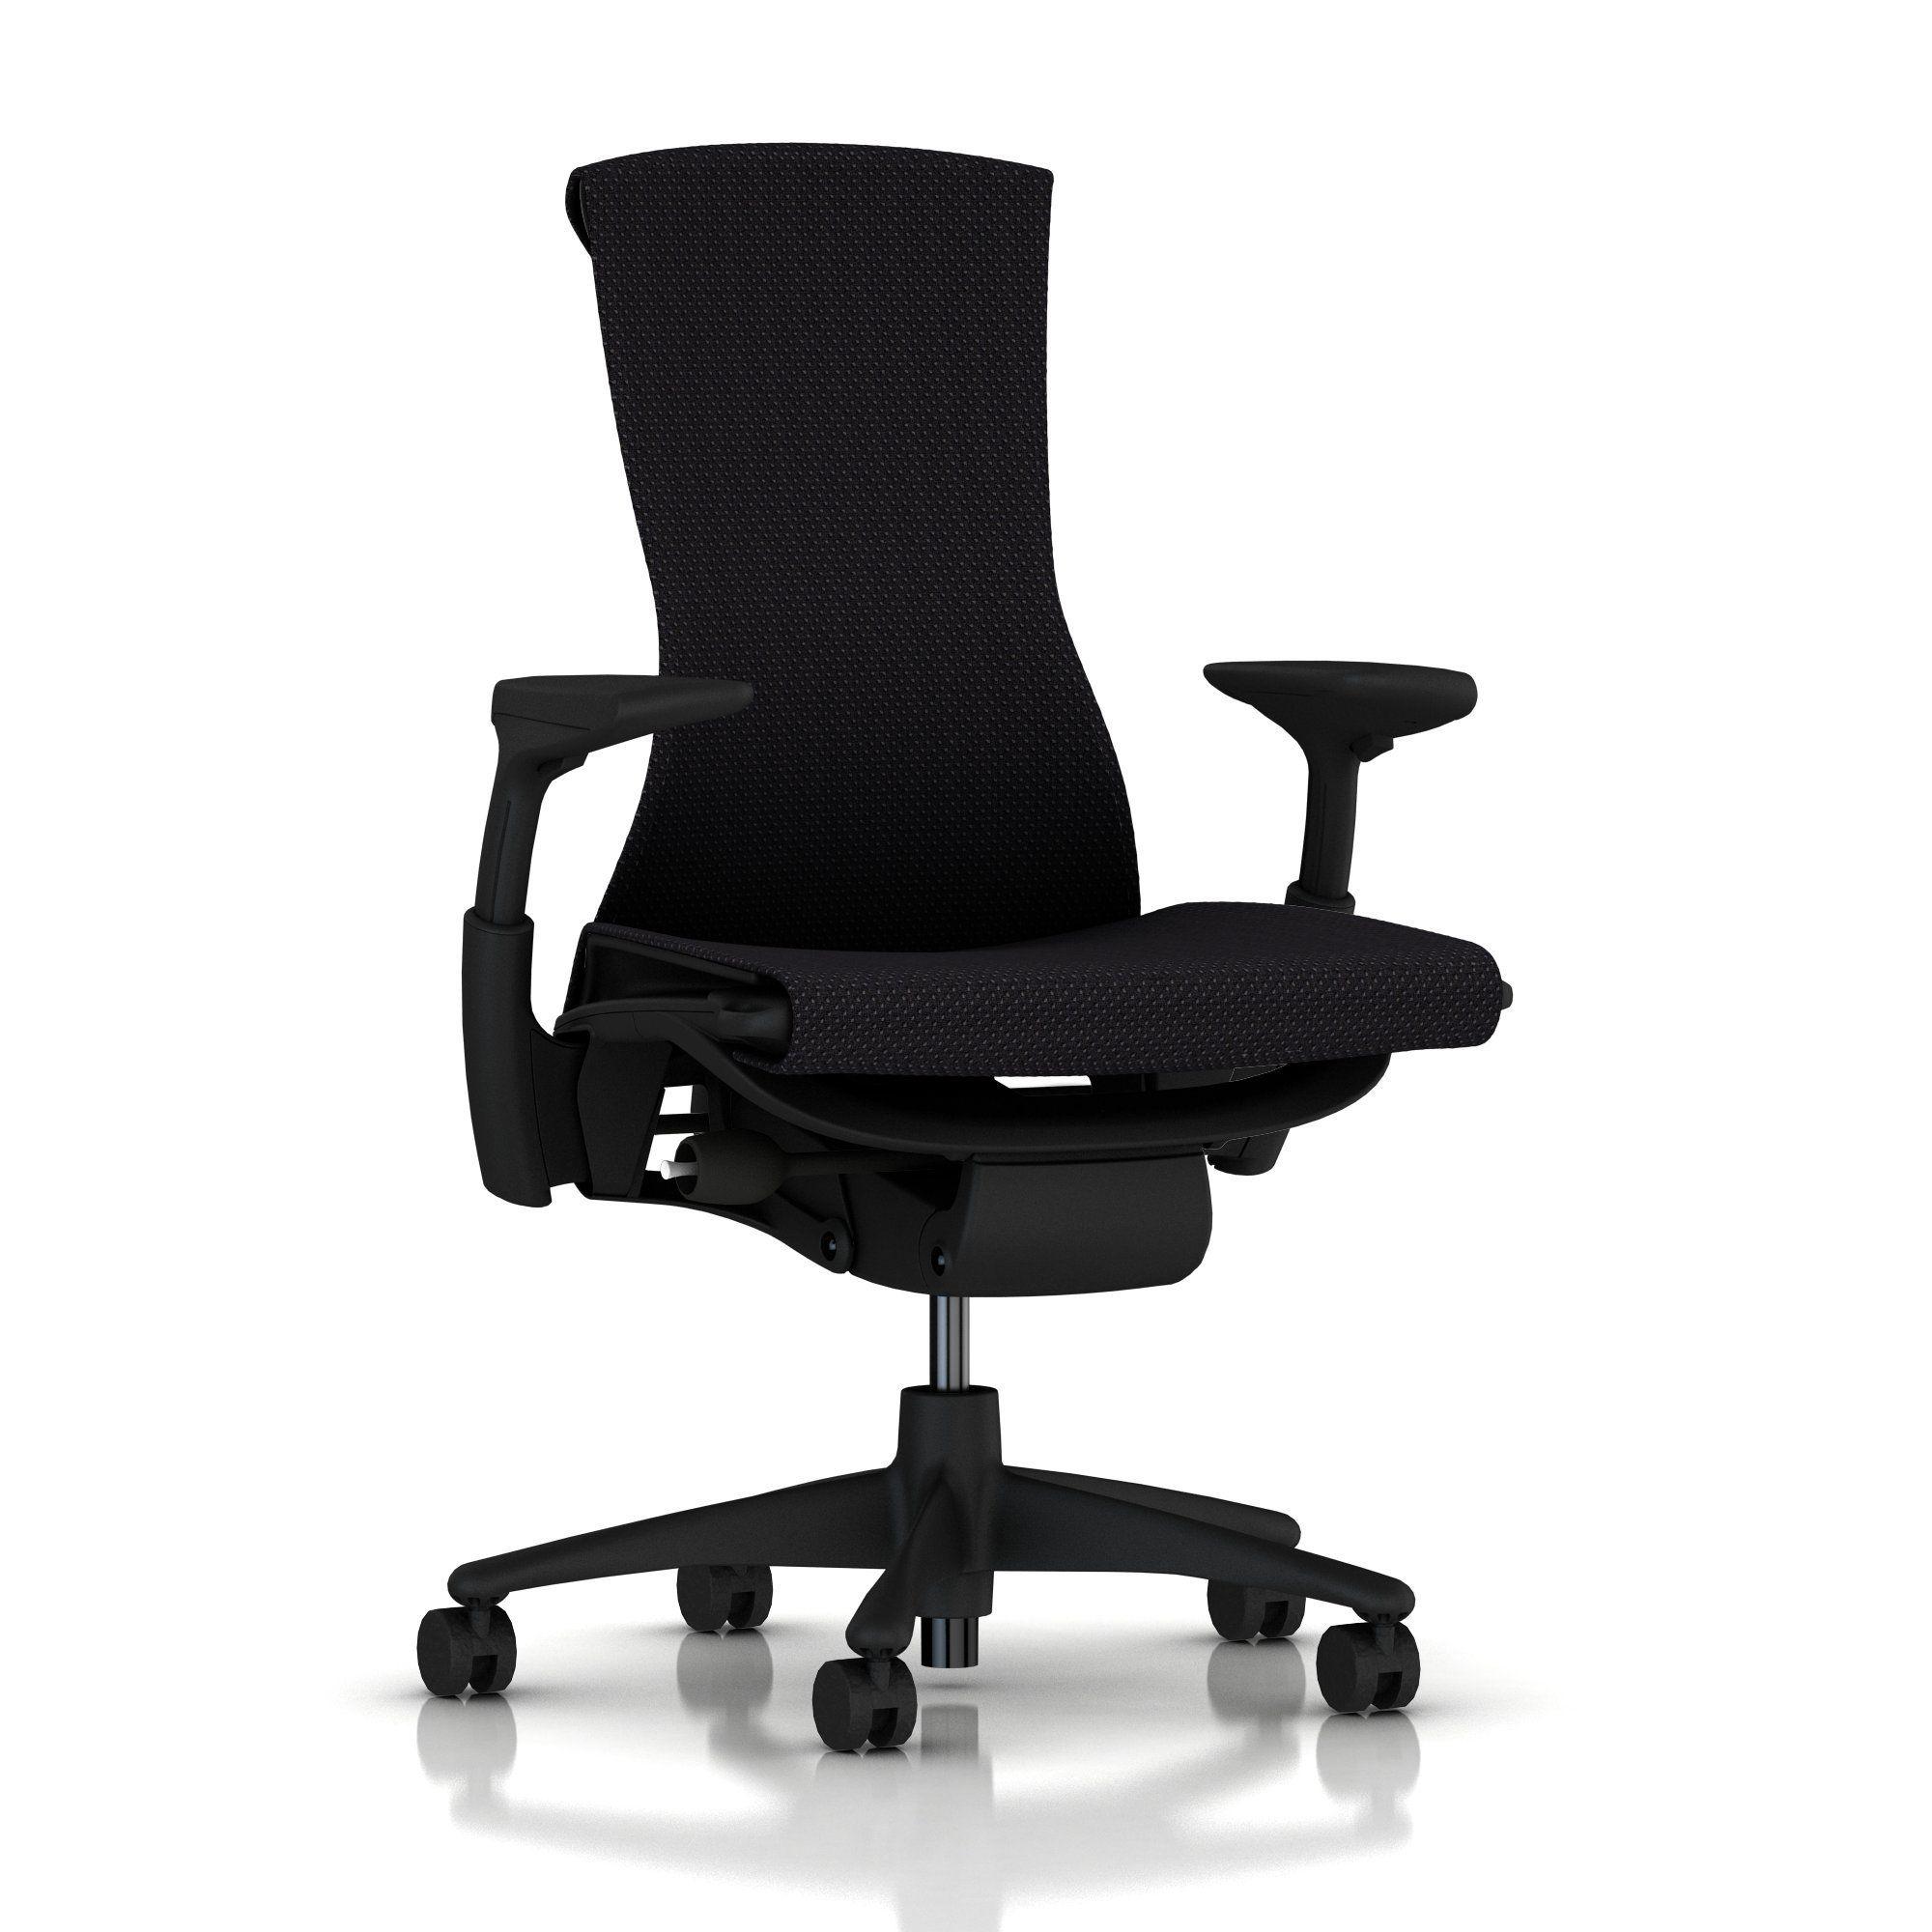 Embody Chair By Herman Miller Fully Adjustable Arms Black